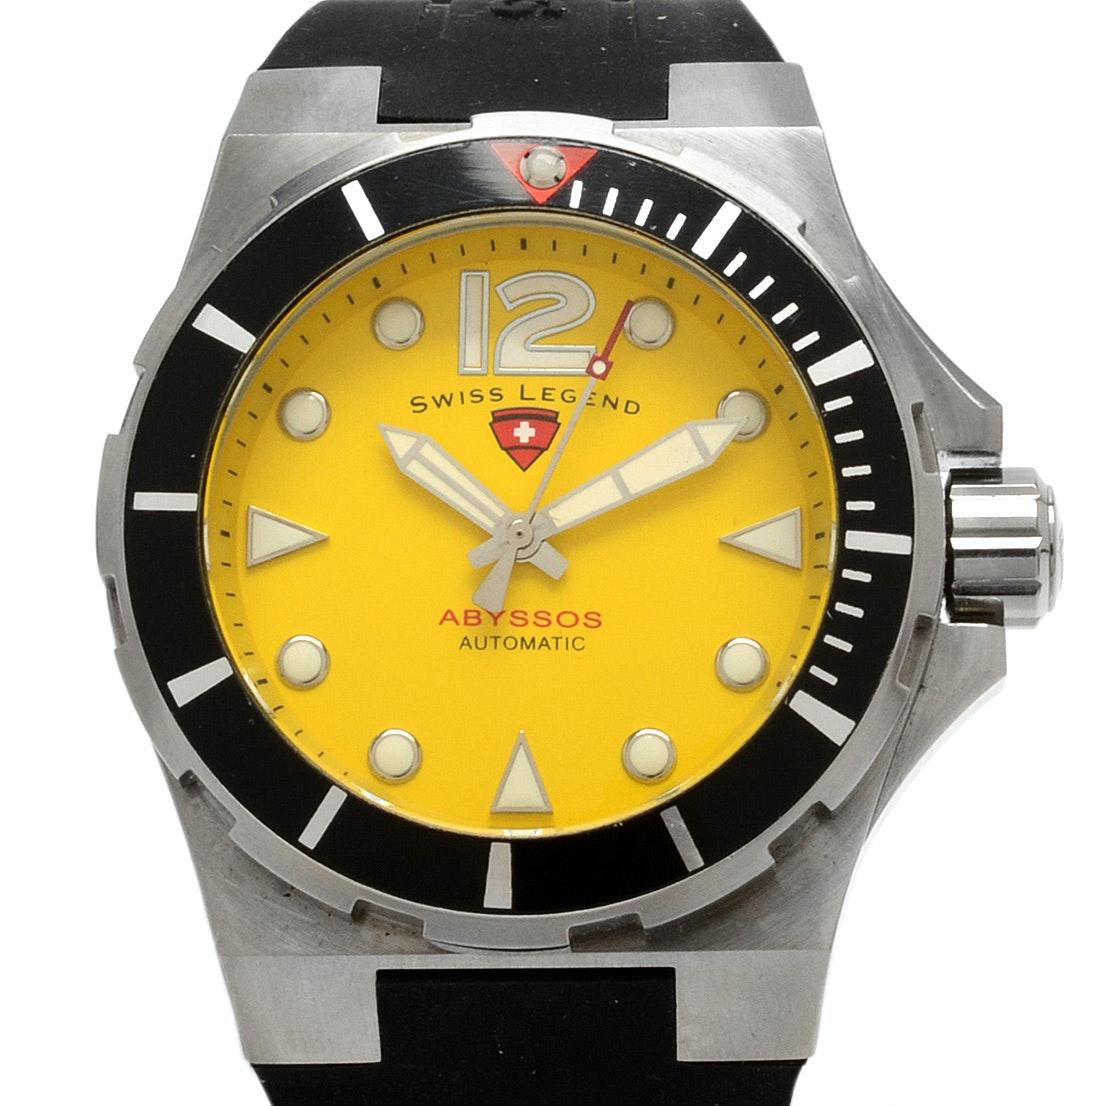 "Swiss Legend ""Abyssos"" Automatic Wristwatch With Watch Winder"